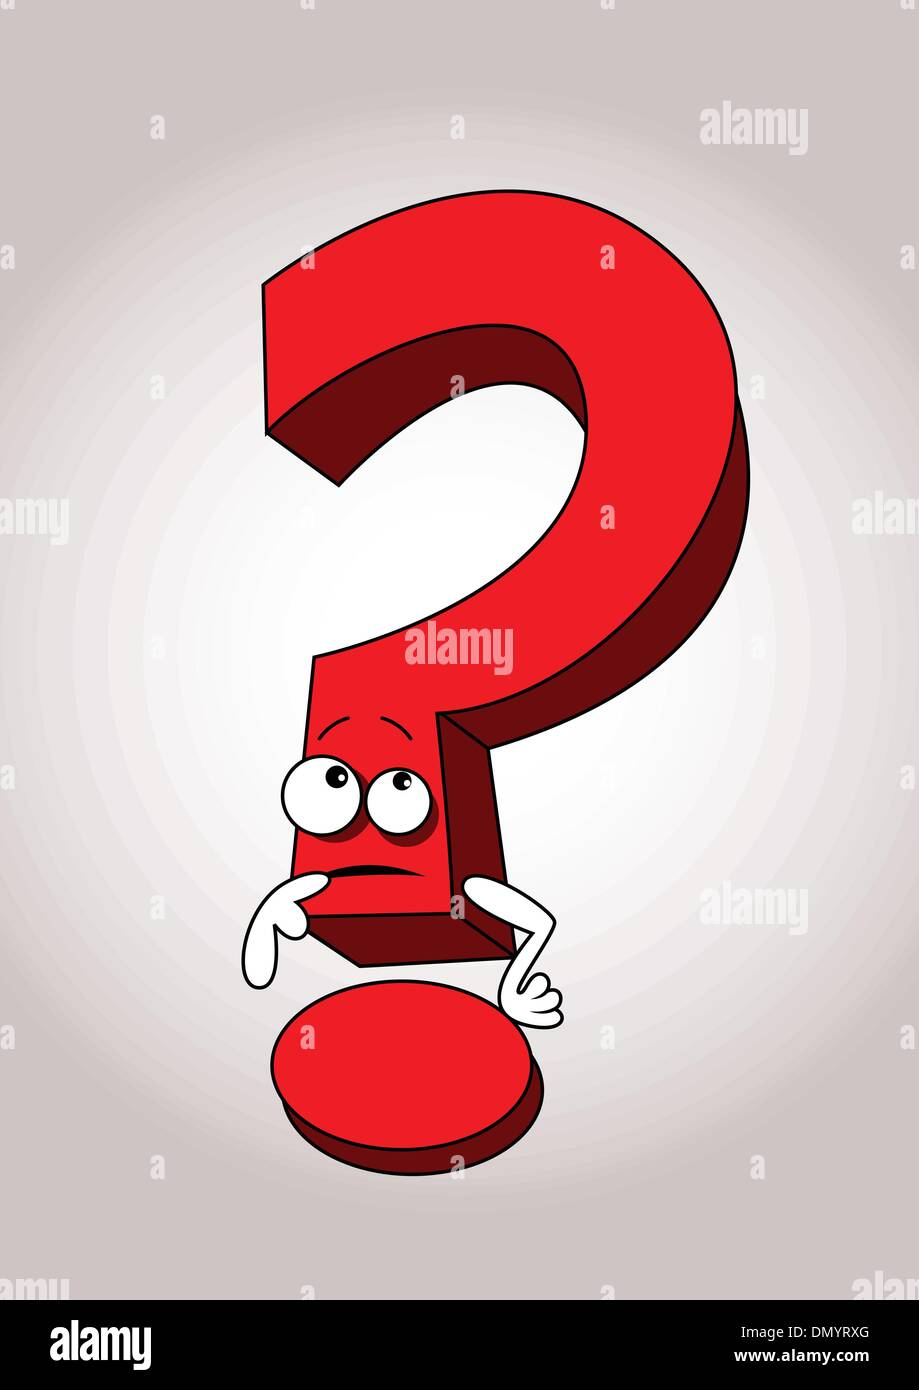 Question Mark Cartoon Stock Vector Images